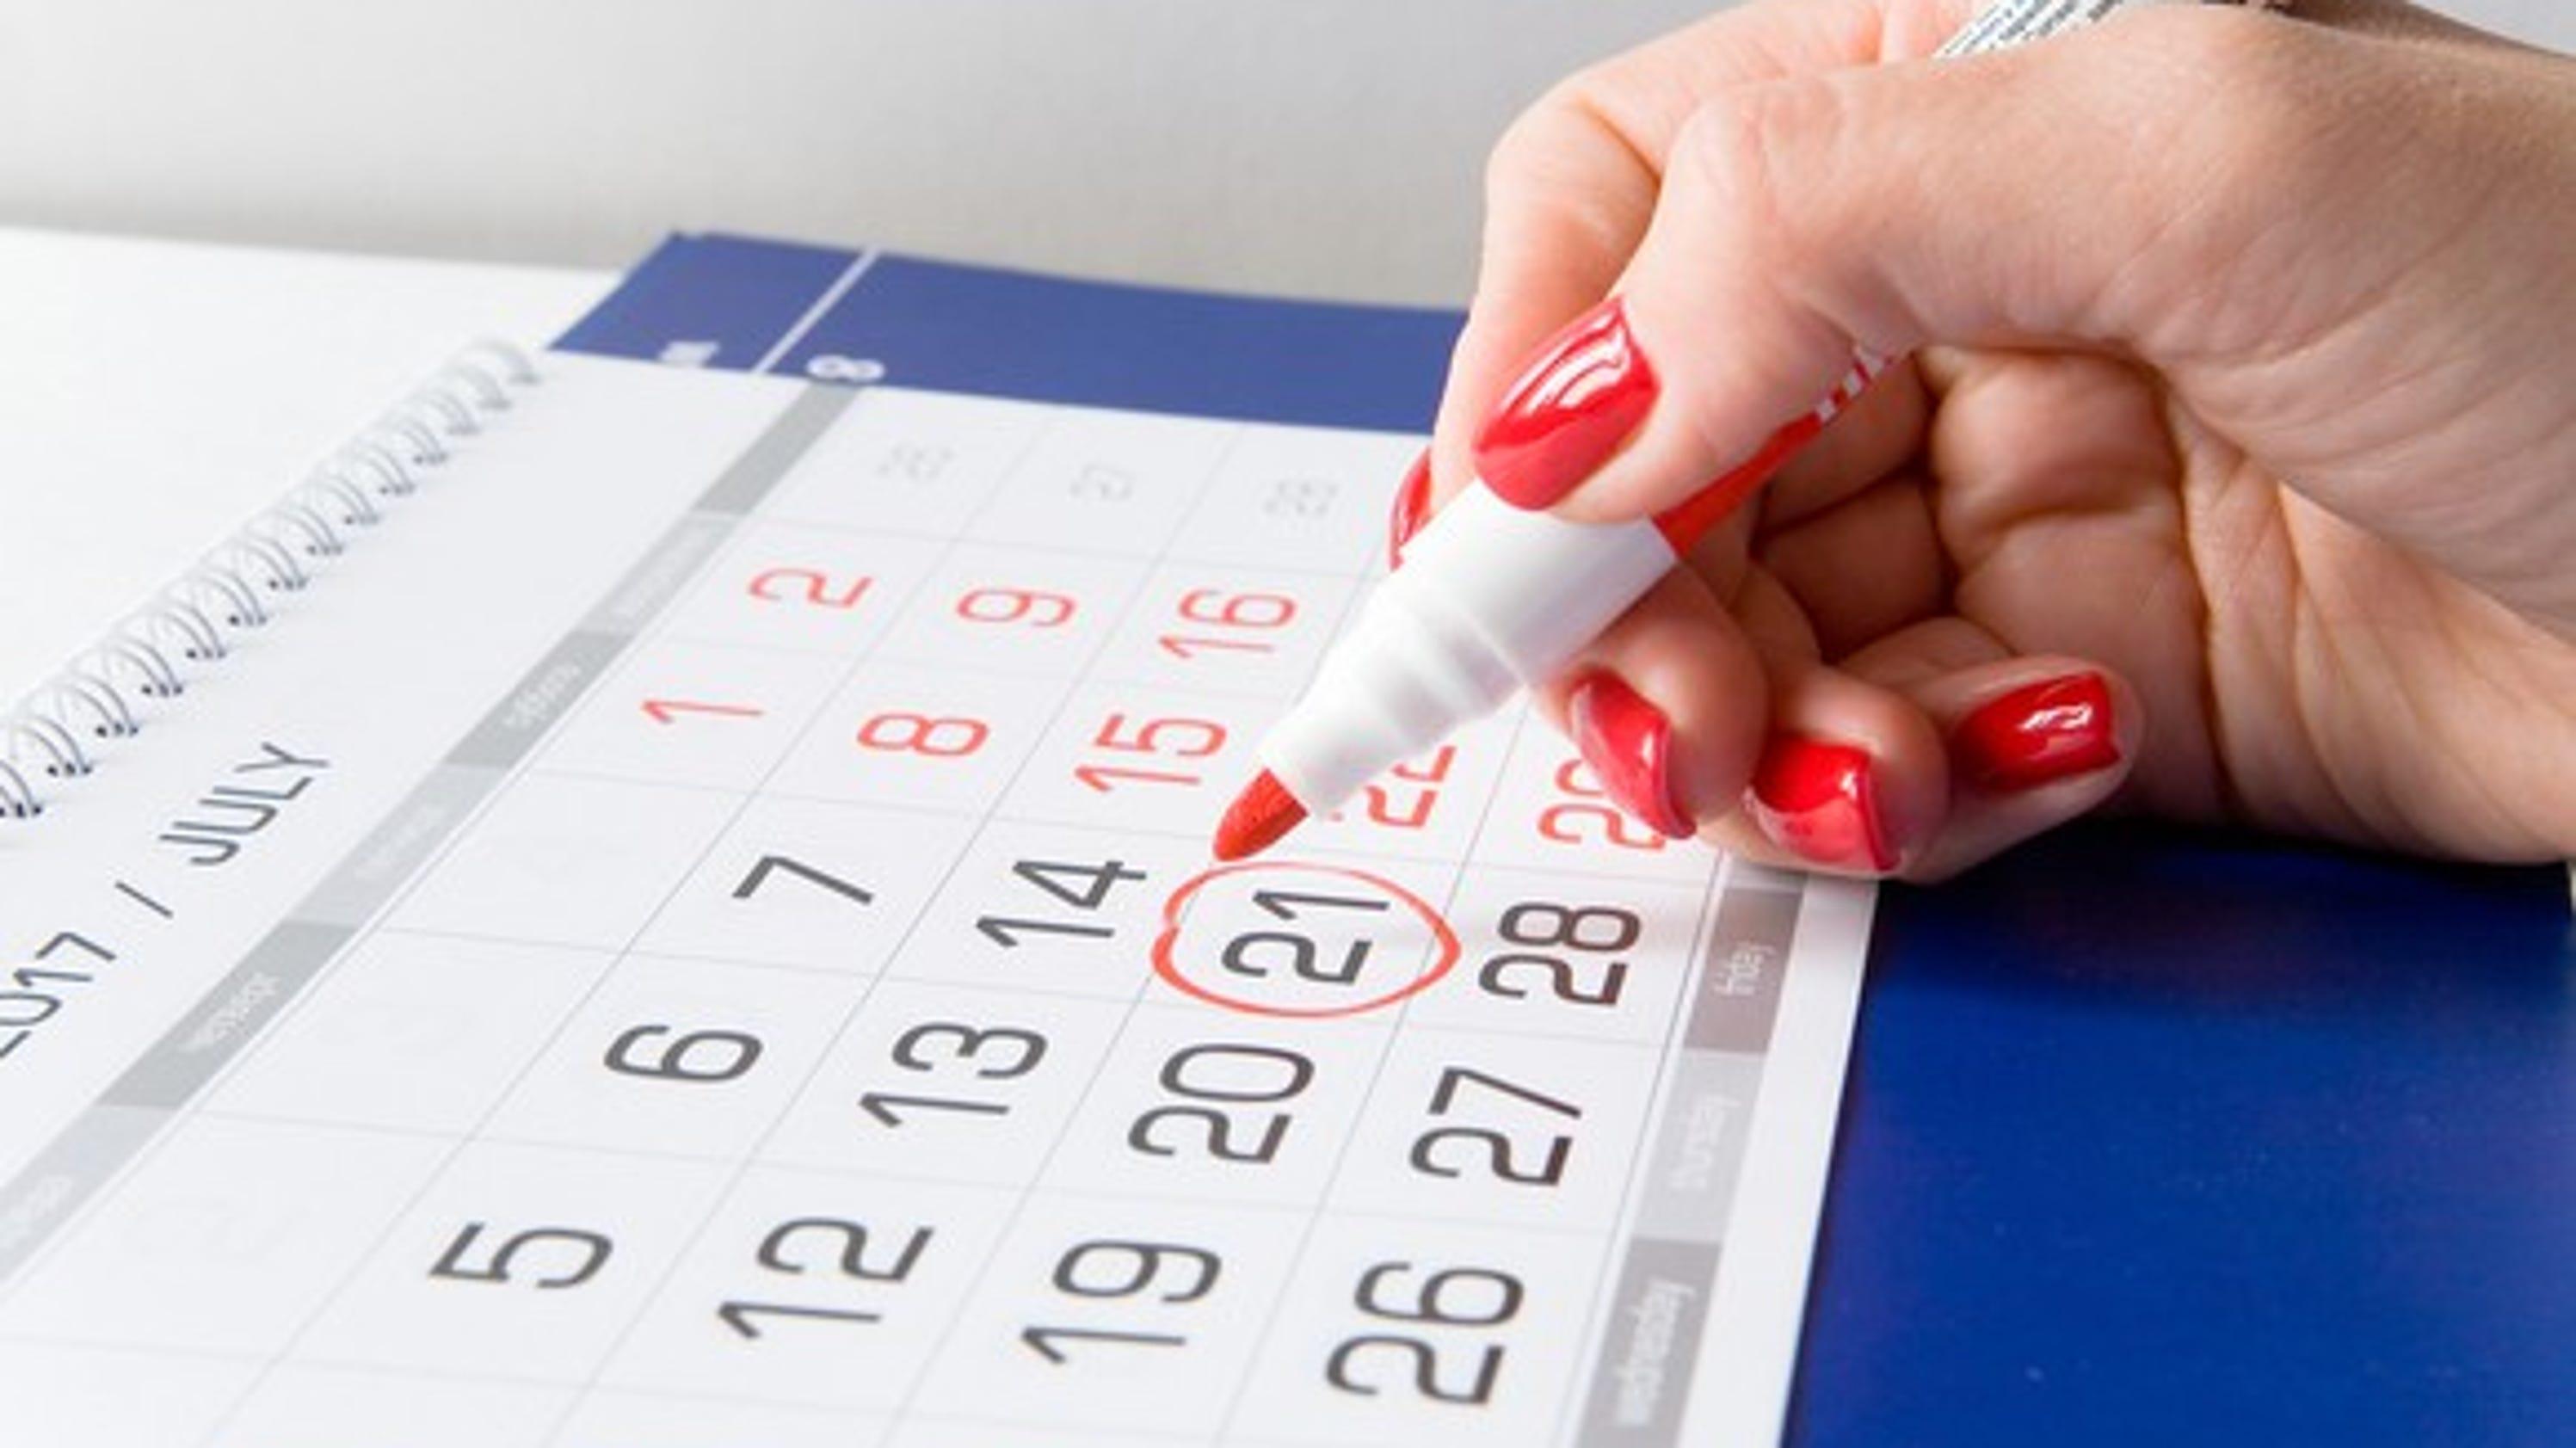 Go local events calendar